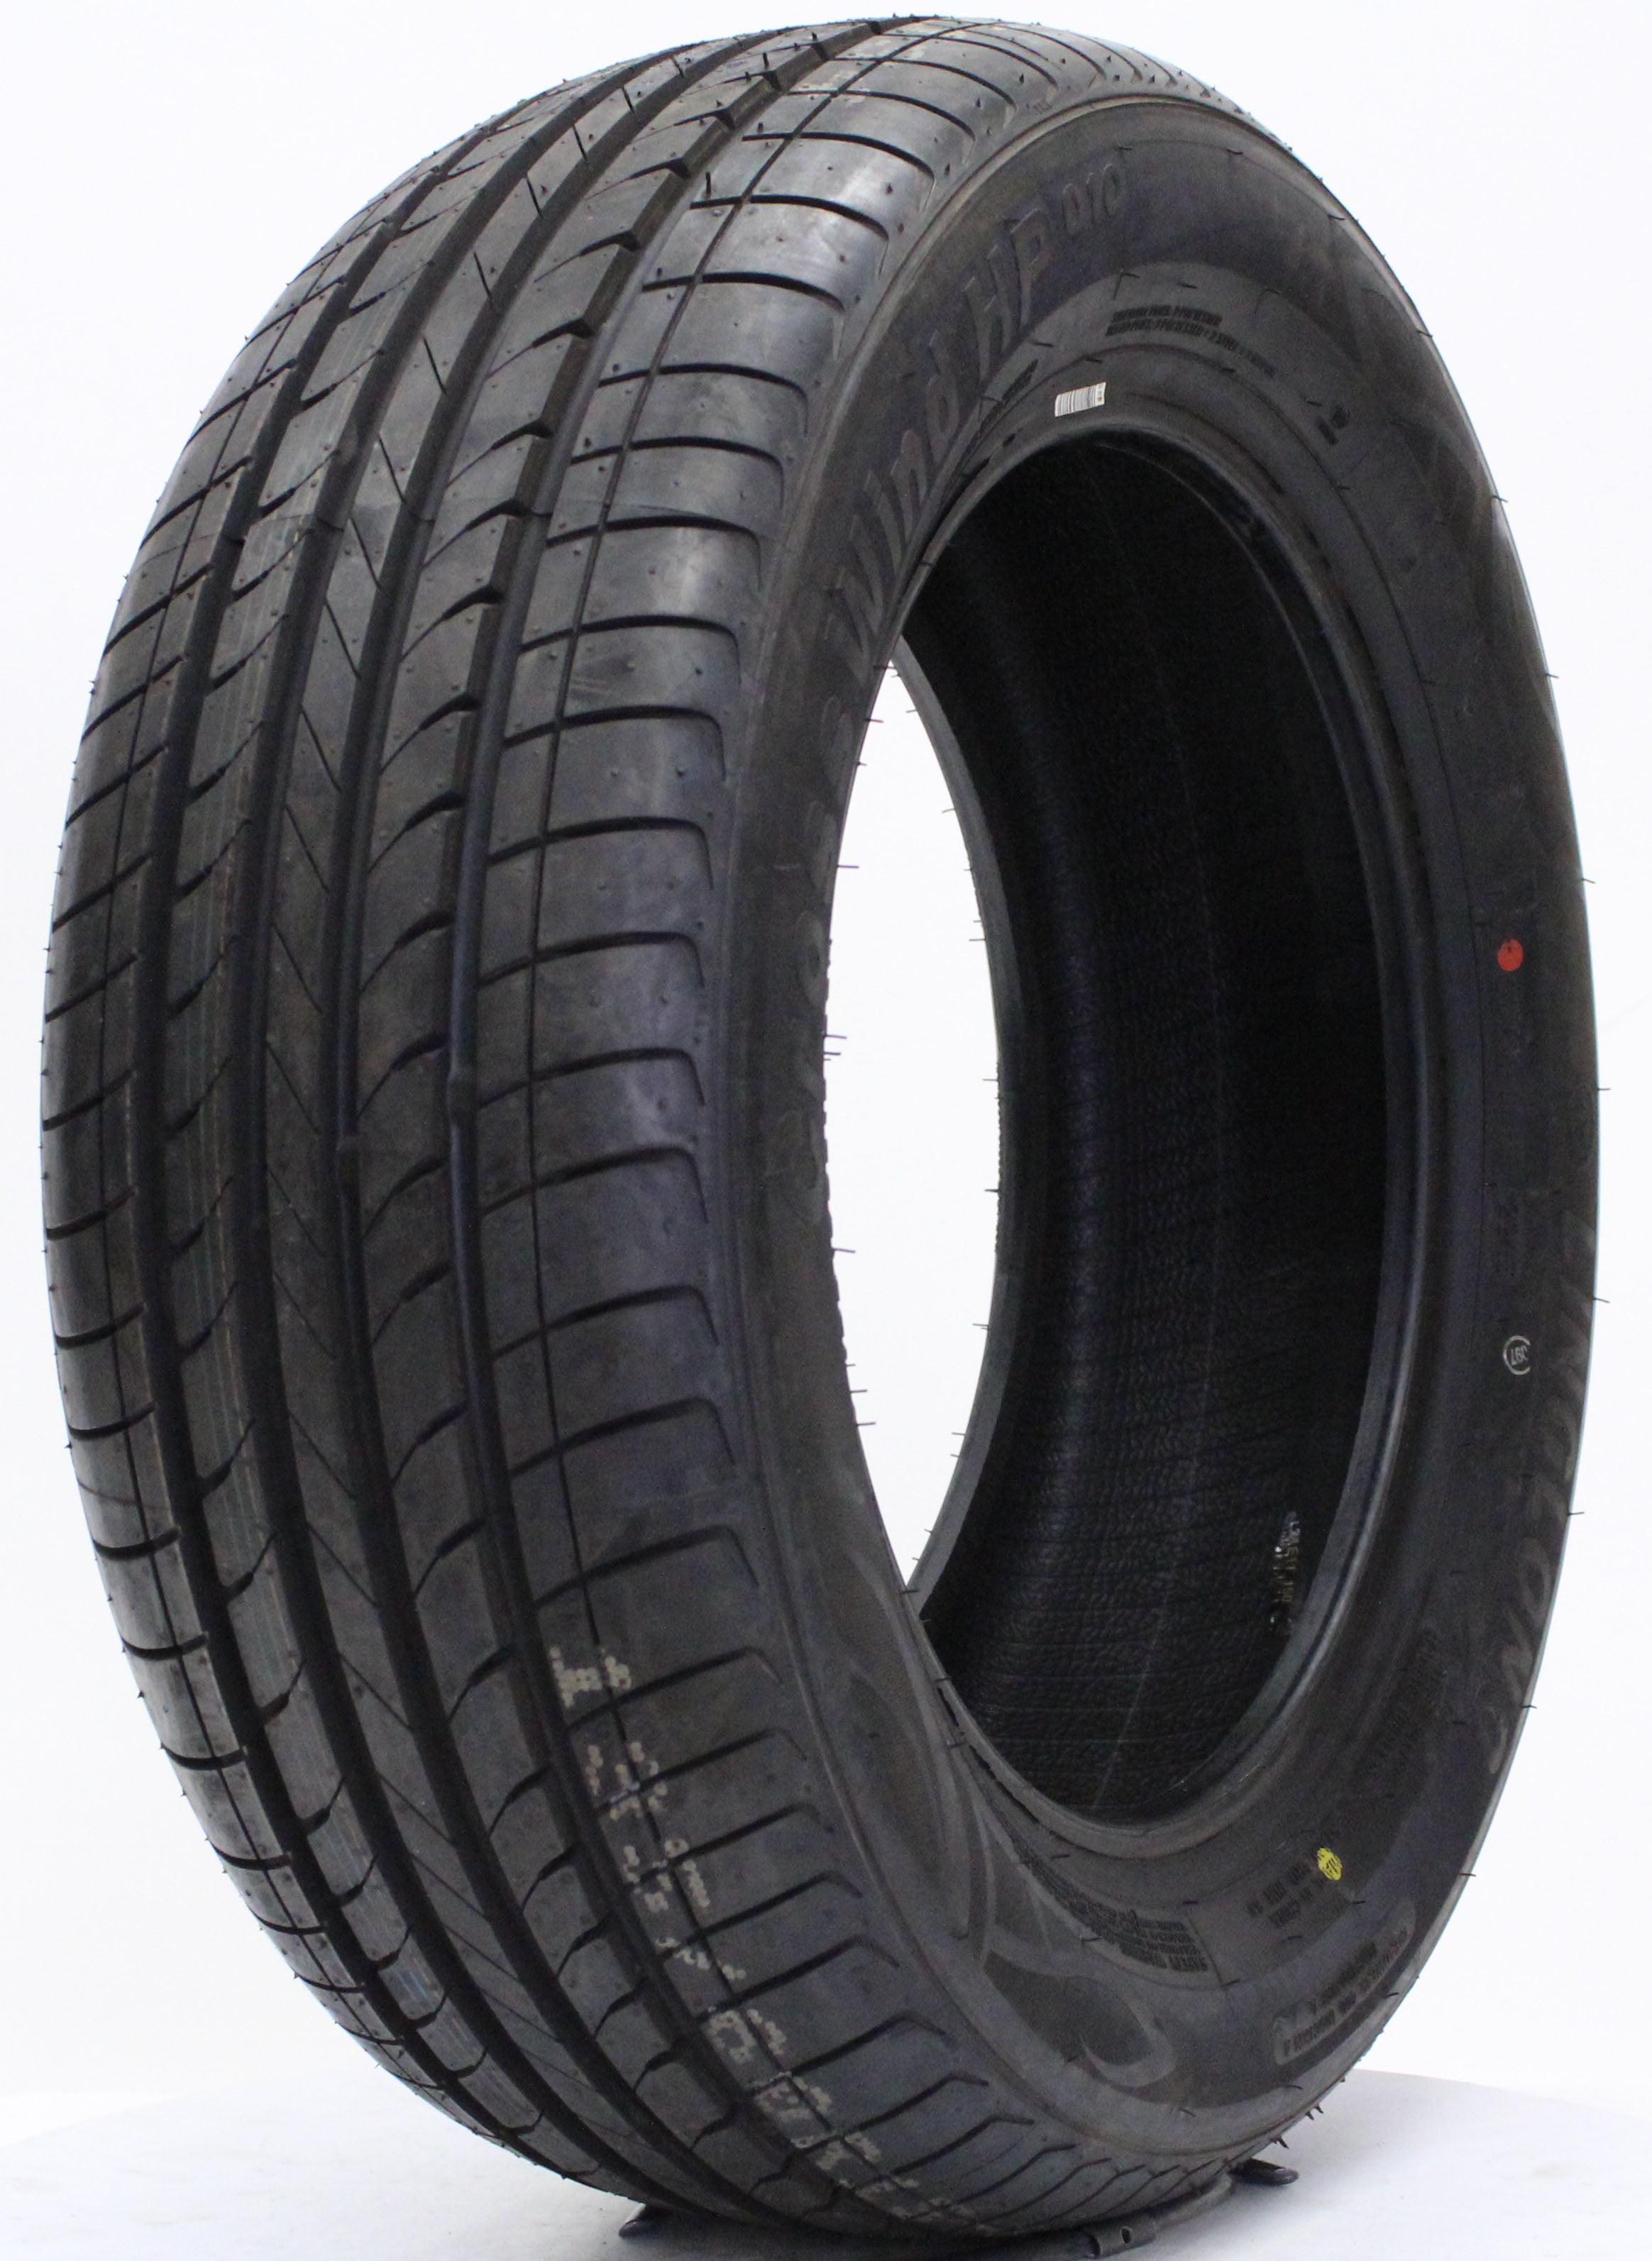 crosswind hp010 195 65r15 91h tire. Black Bedroom Furniture Sets. Home Design Ideas